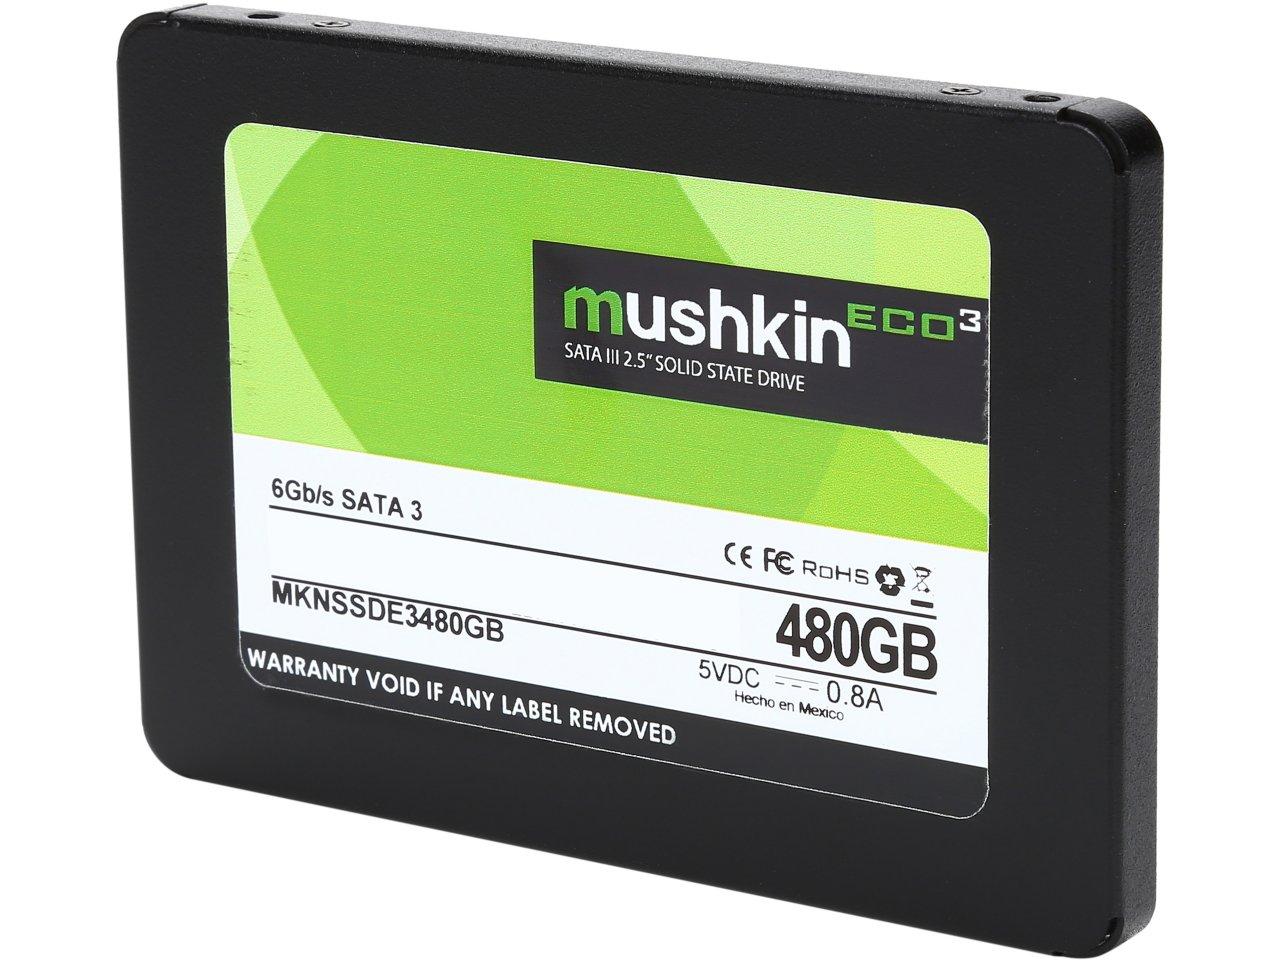 "480 GB Mushkin Enhanced ECO3 2.5"" SATA III TLC Internal SSD for $97.99 AC, 4 TB Seagate Expansion Portable USB 3.0 External Hard Drive for $109.99 AC & More @ Newegg.com"